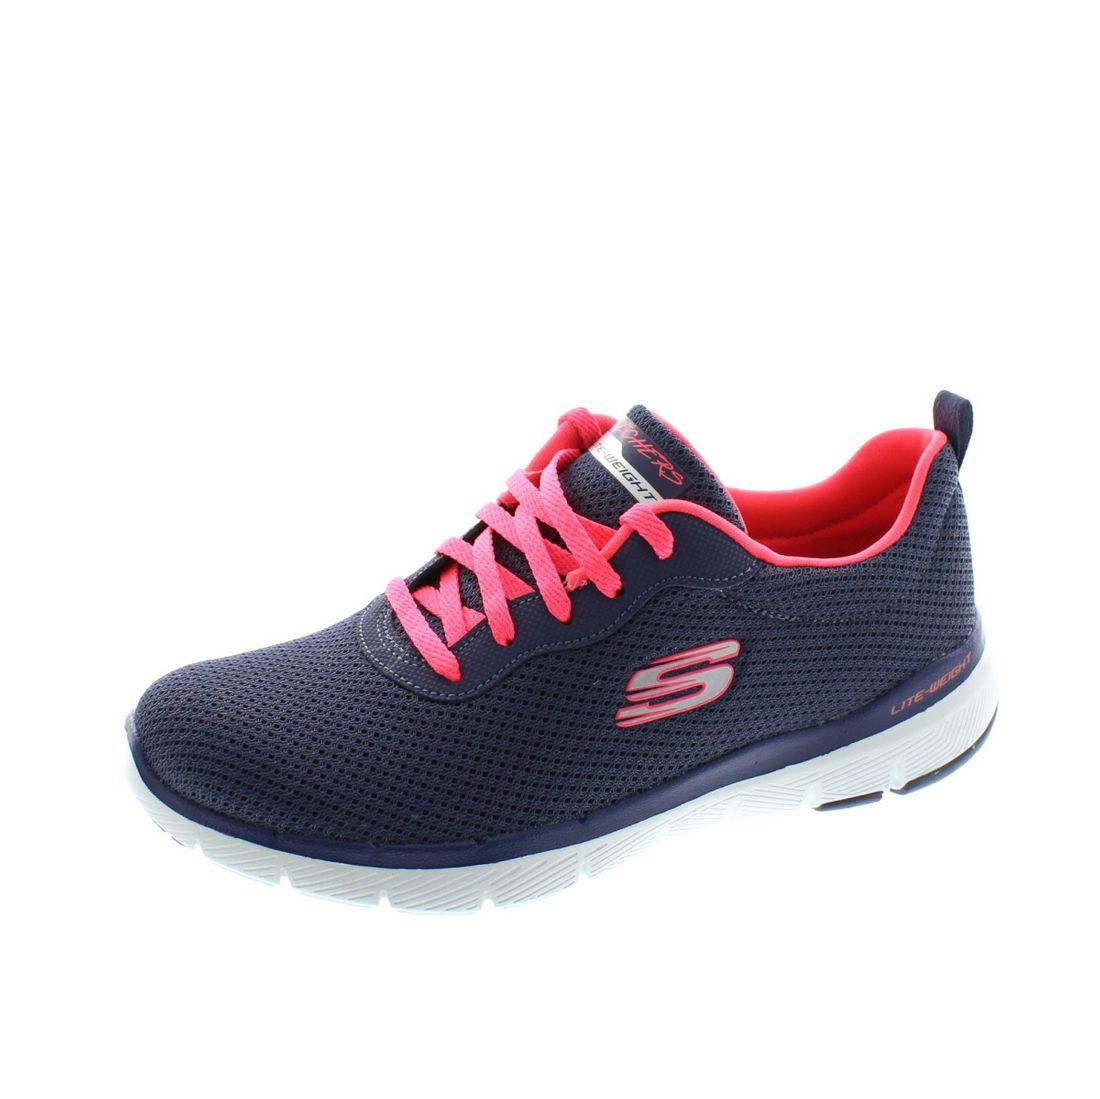 Skechers - Flex Appeal 3.0 First Insight 13070 - slate pink